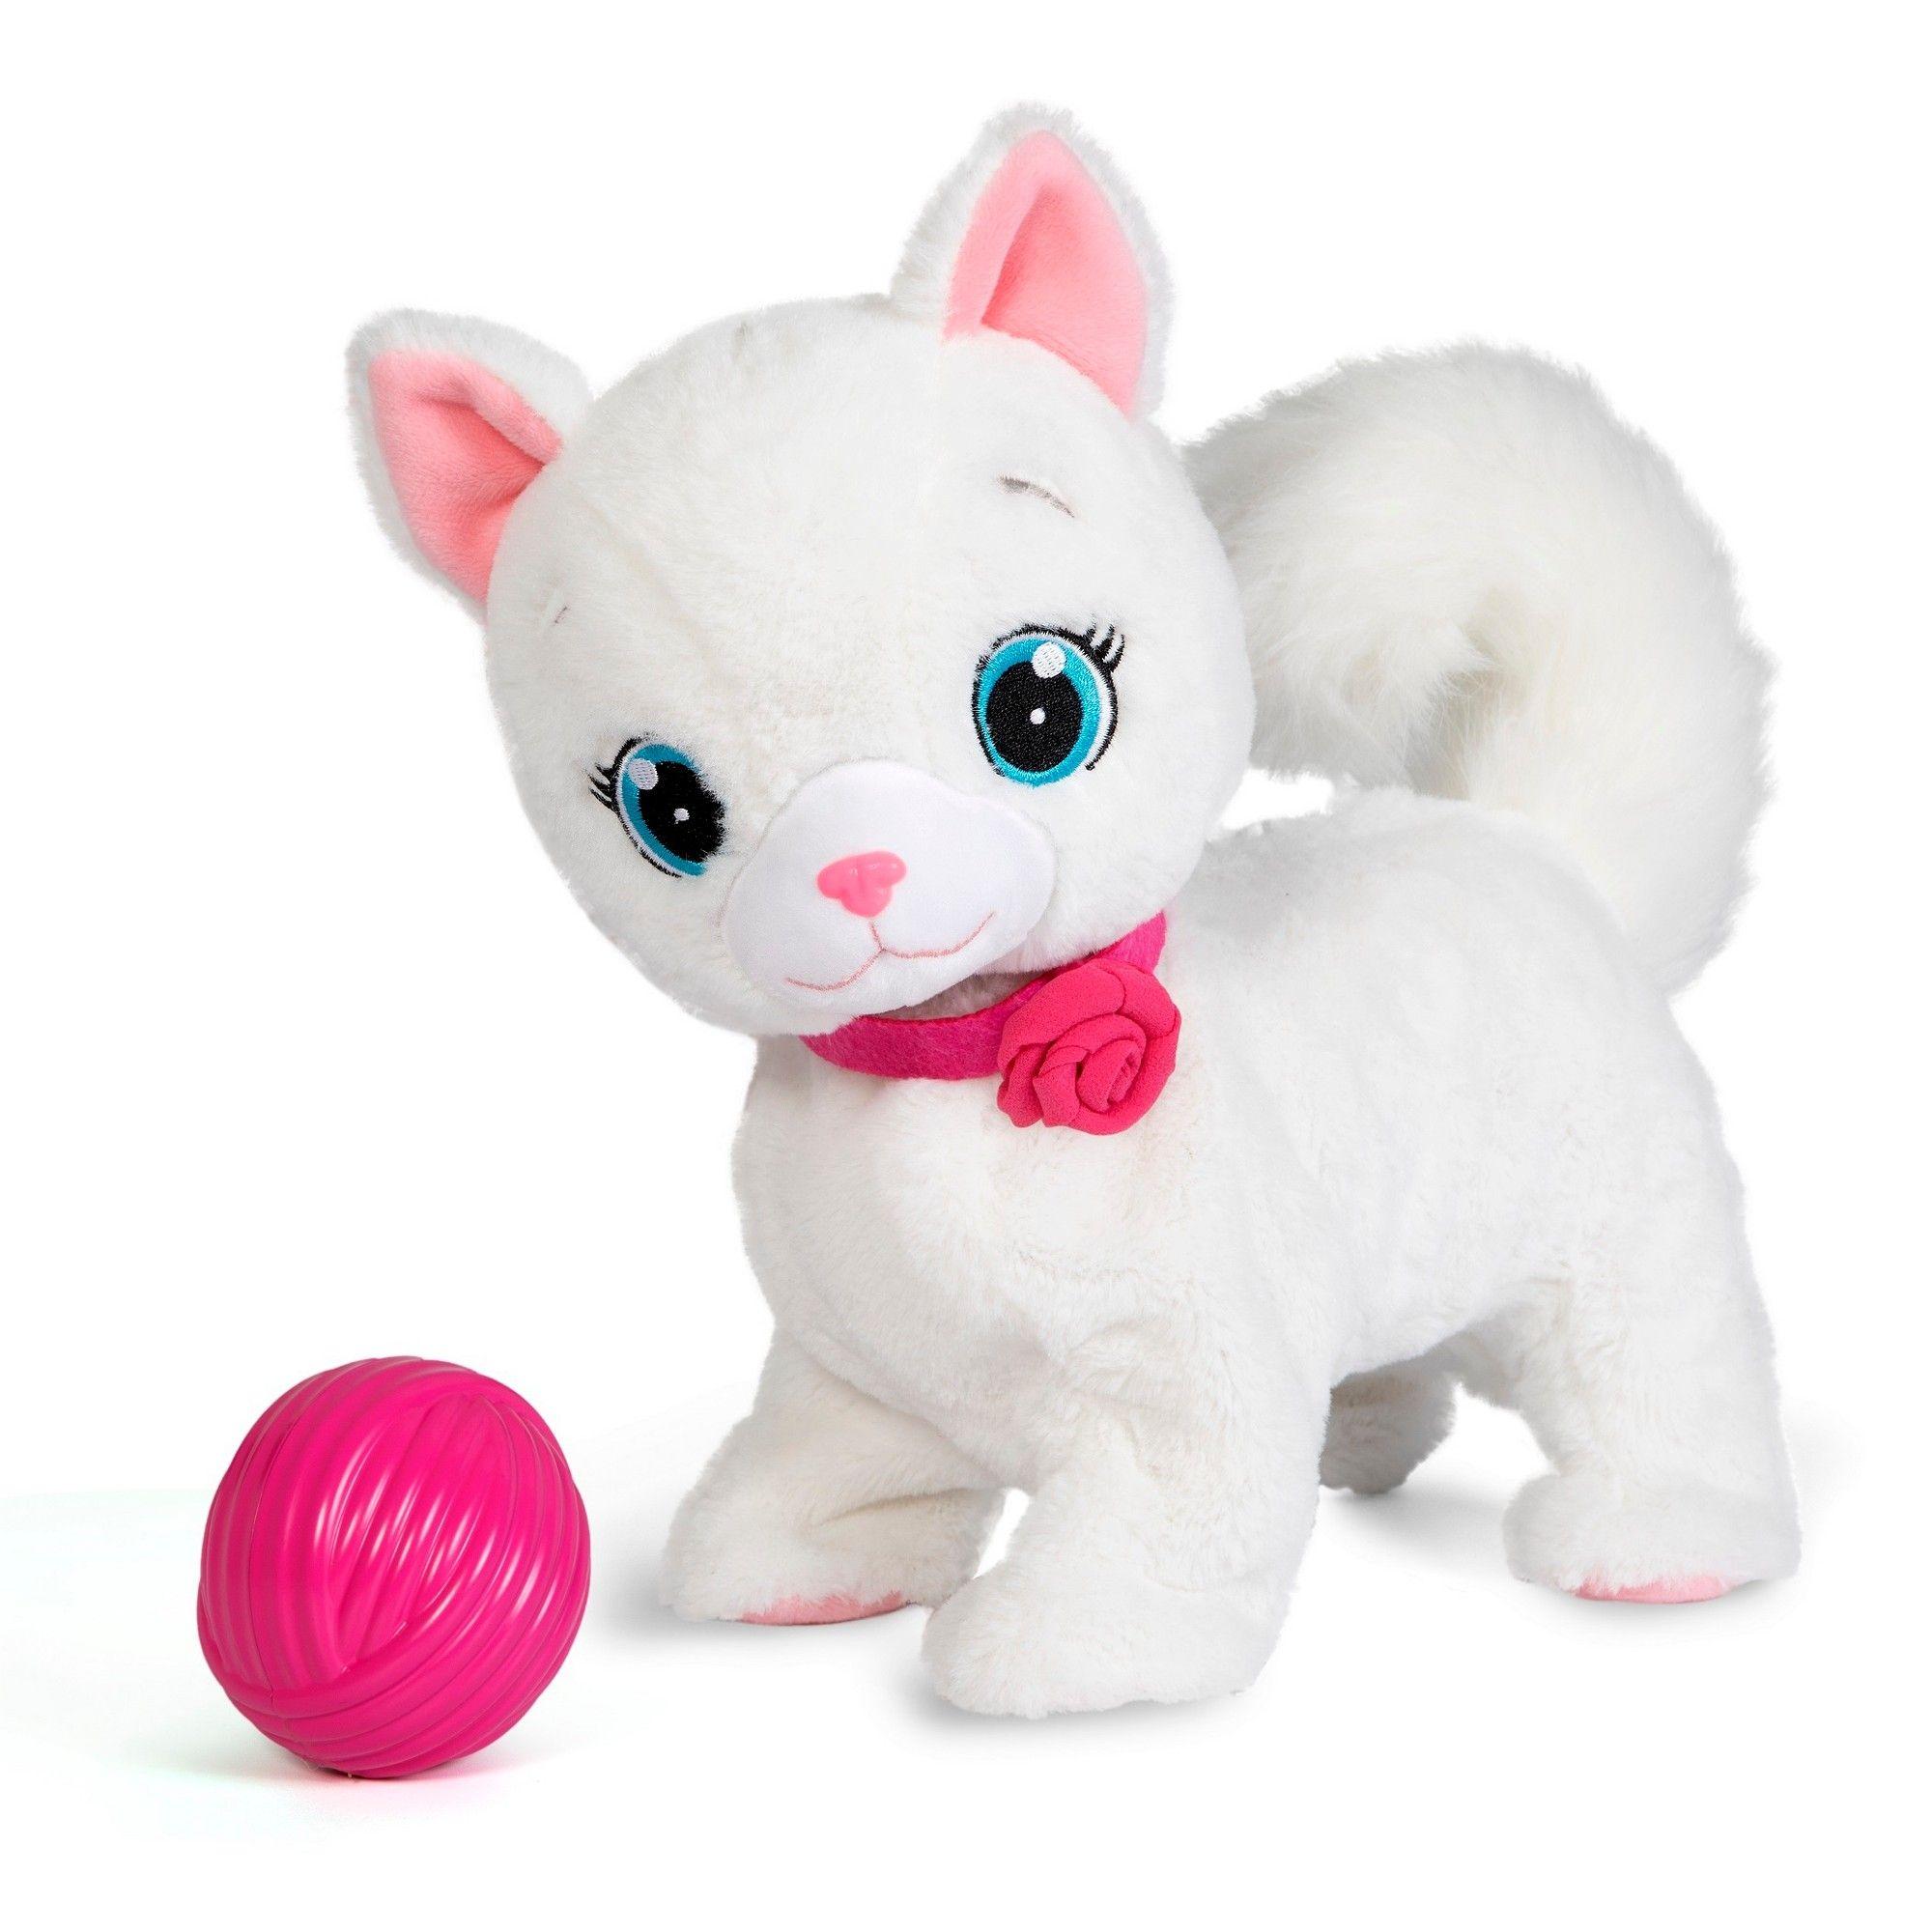 Club Petz Bianca Kitty Stuffed Animals And Plush Kitty Interactive Cat Toys Soft Toy